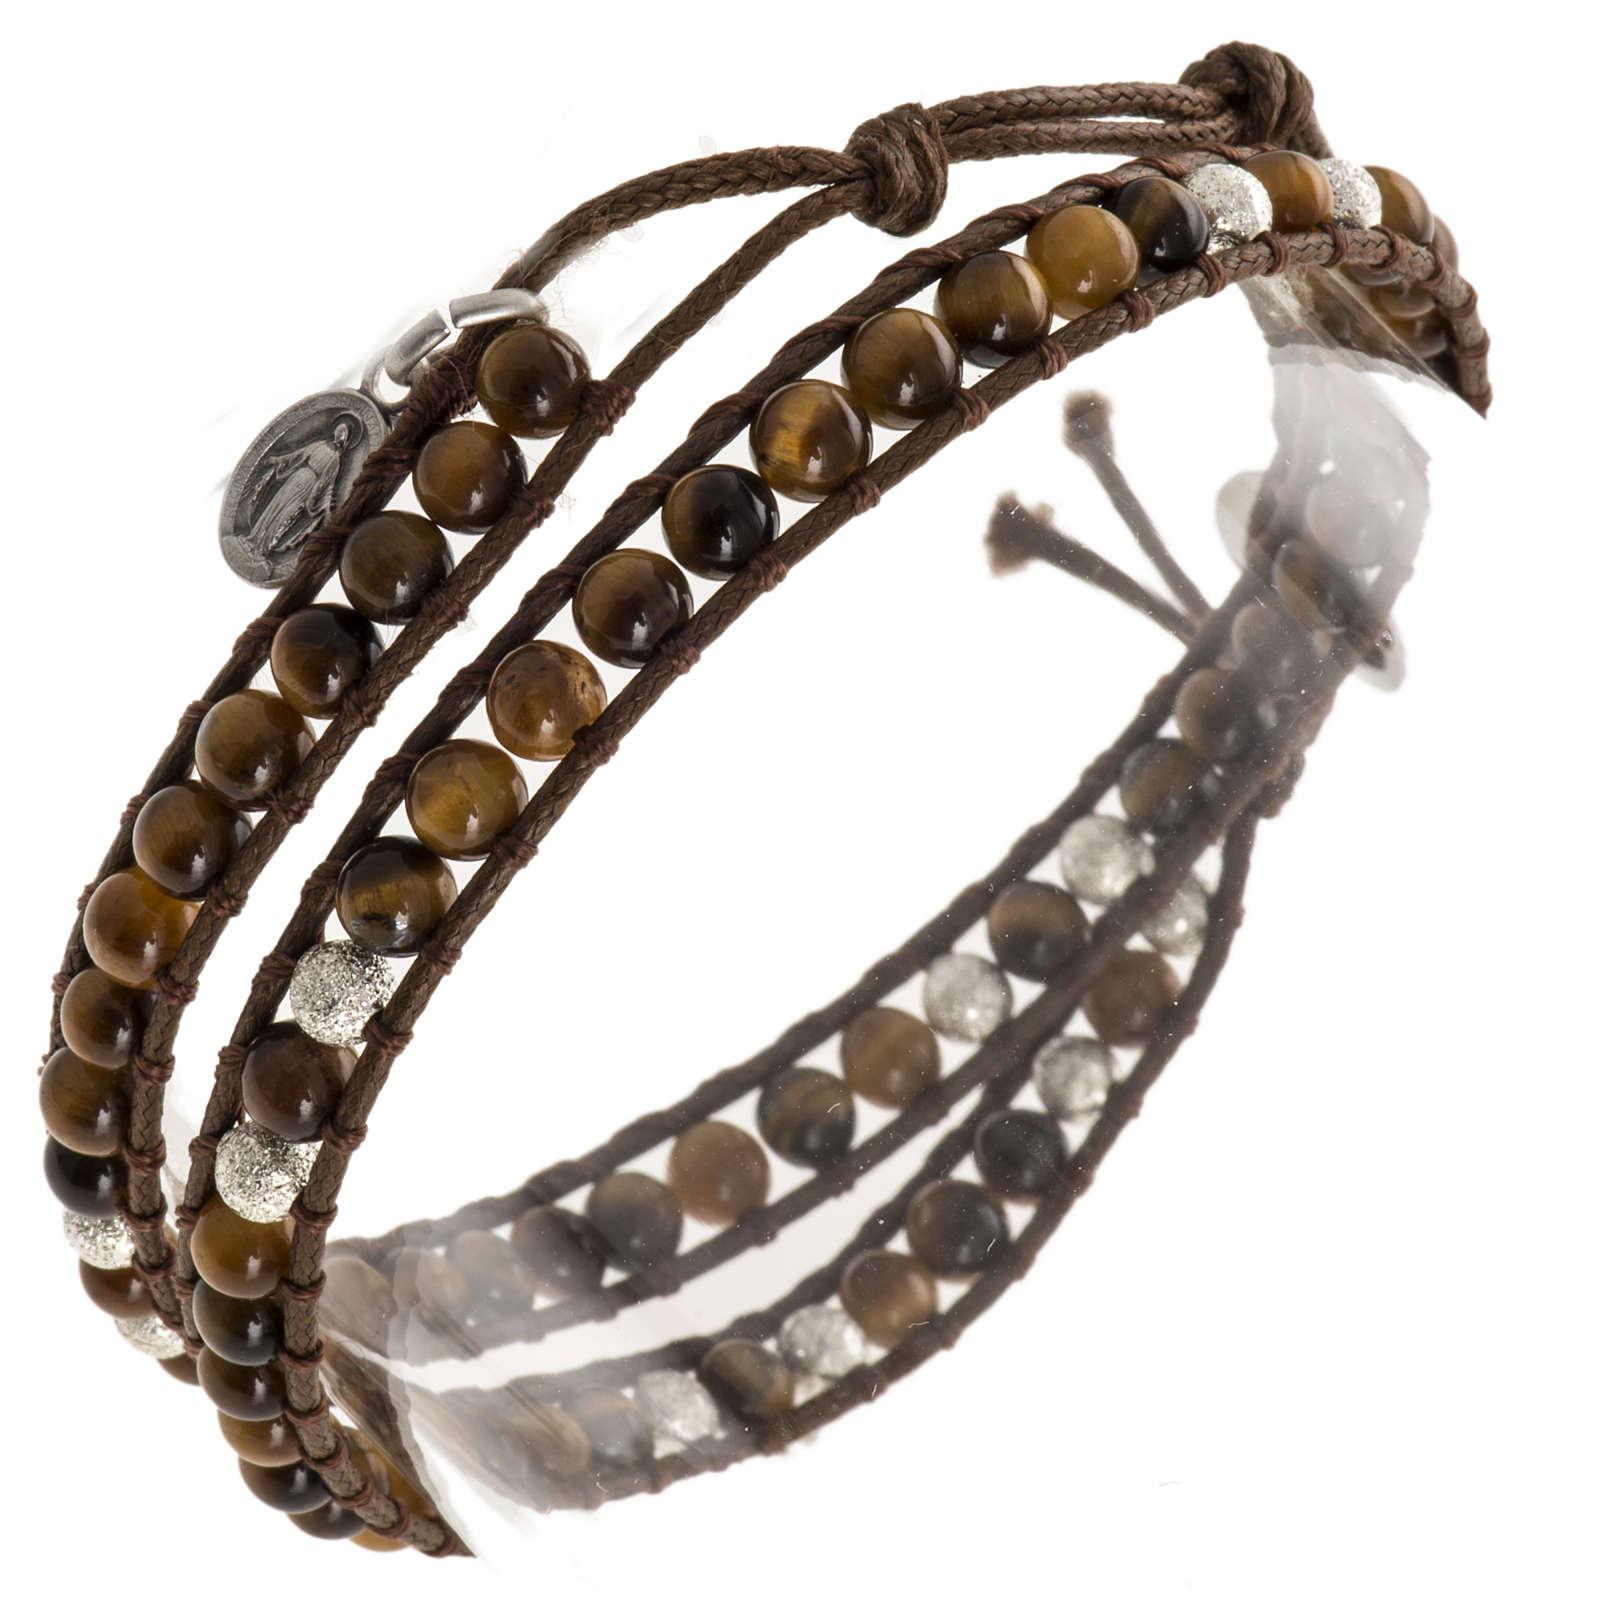 Bracelet chapelet oeil de tigre 4mm 4